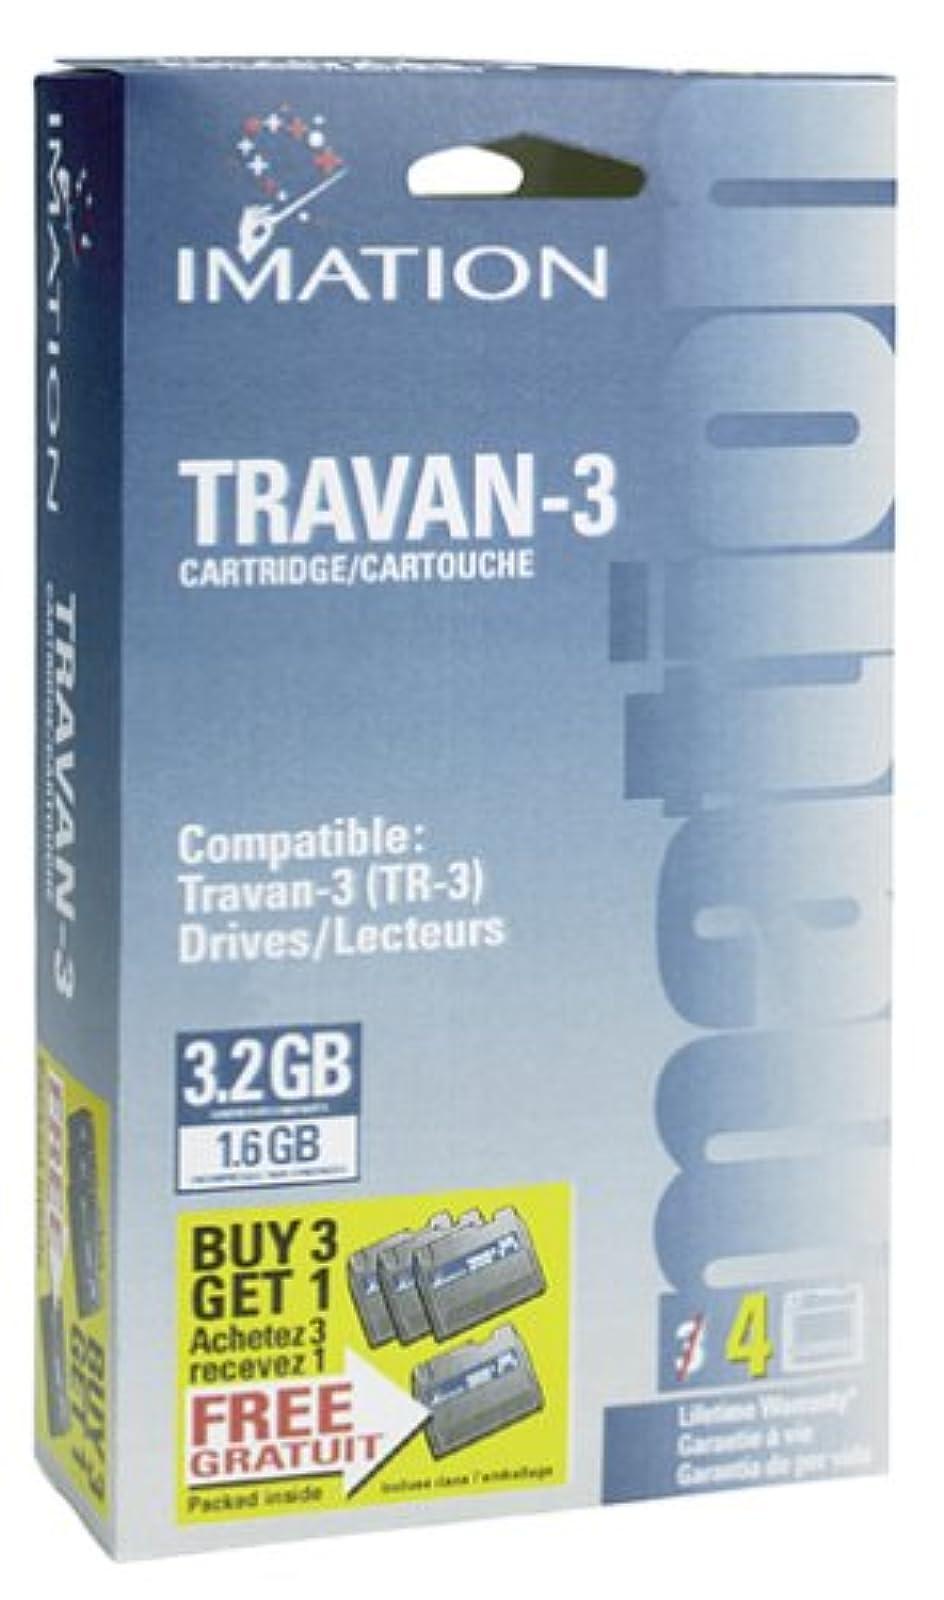 Imation TRAVAN-3 Data Cartridge 3.2GB Single